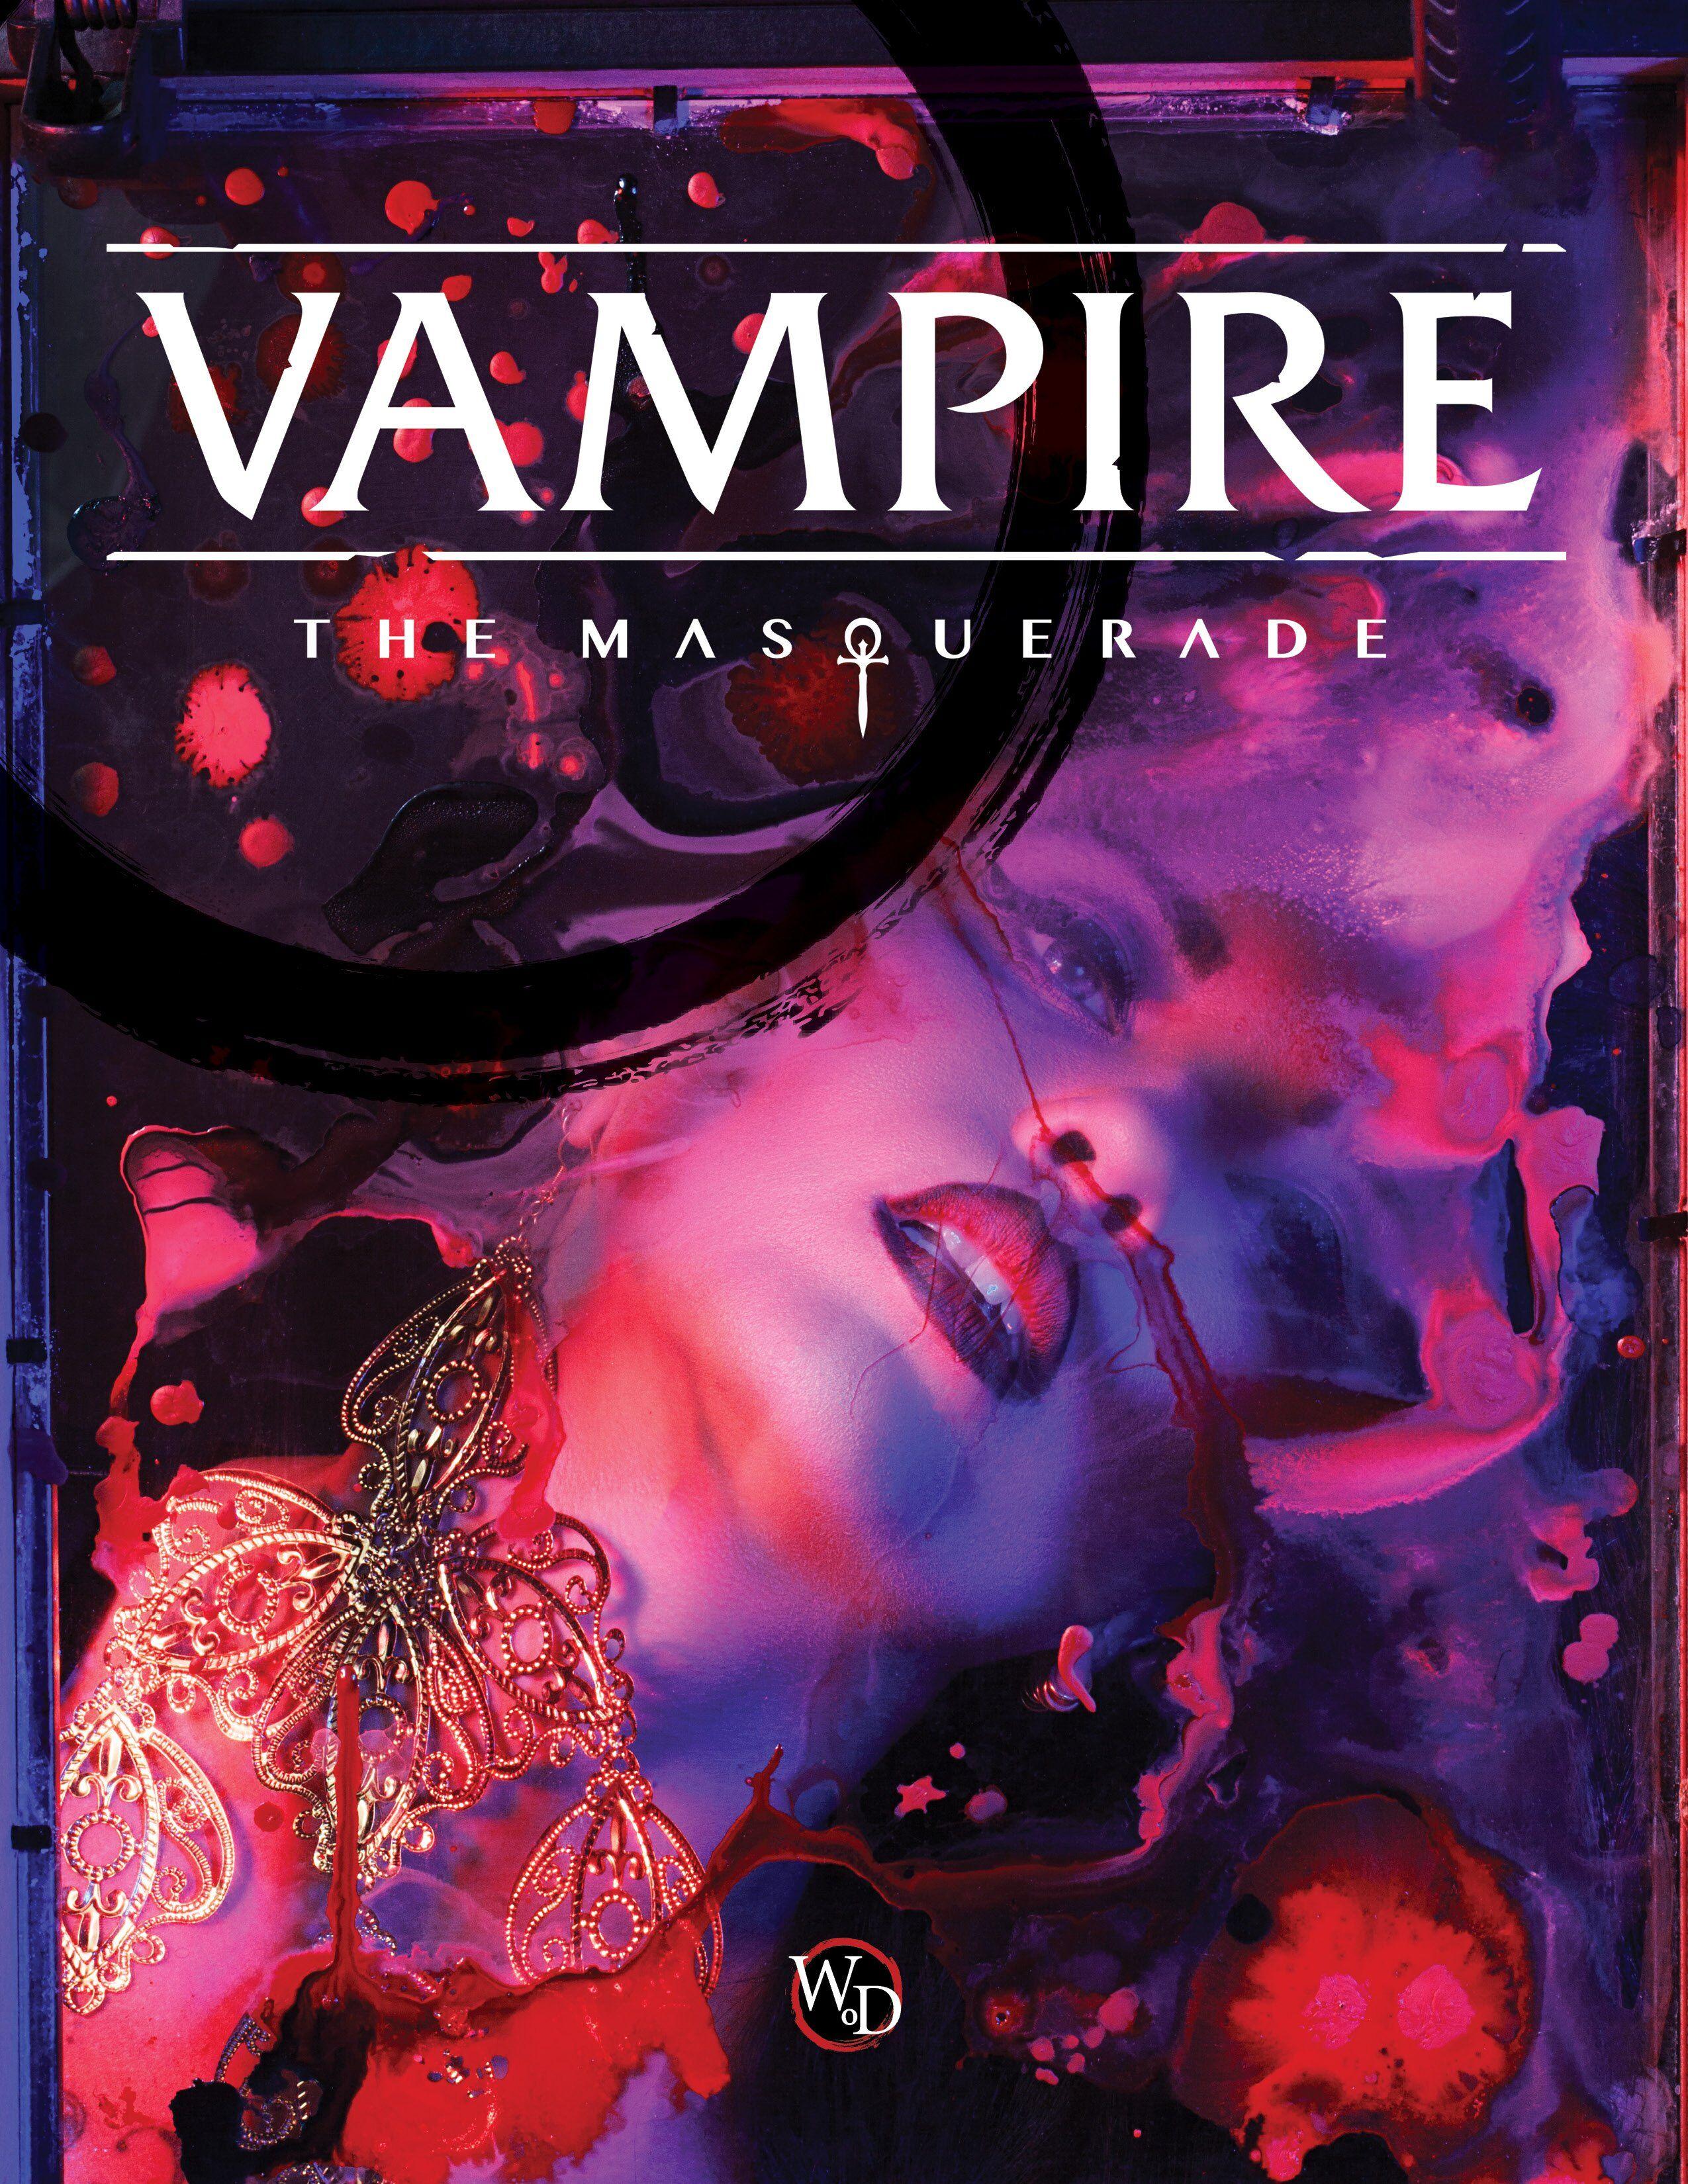 Vampire The Masquerade Regelbok 5th Edition Core Book  Hardback